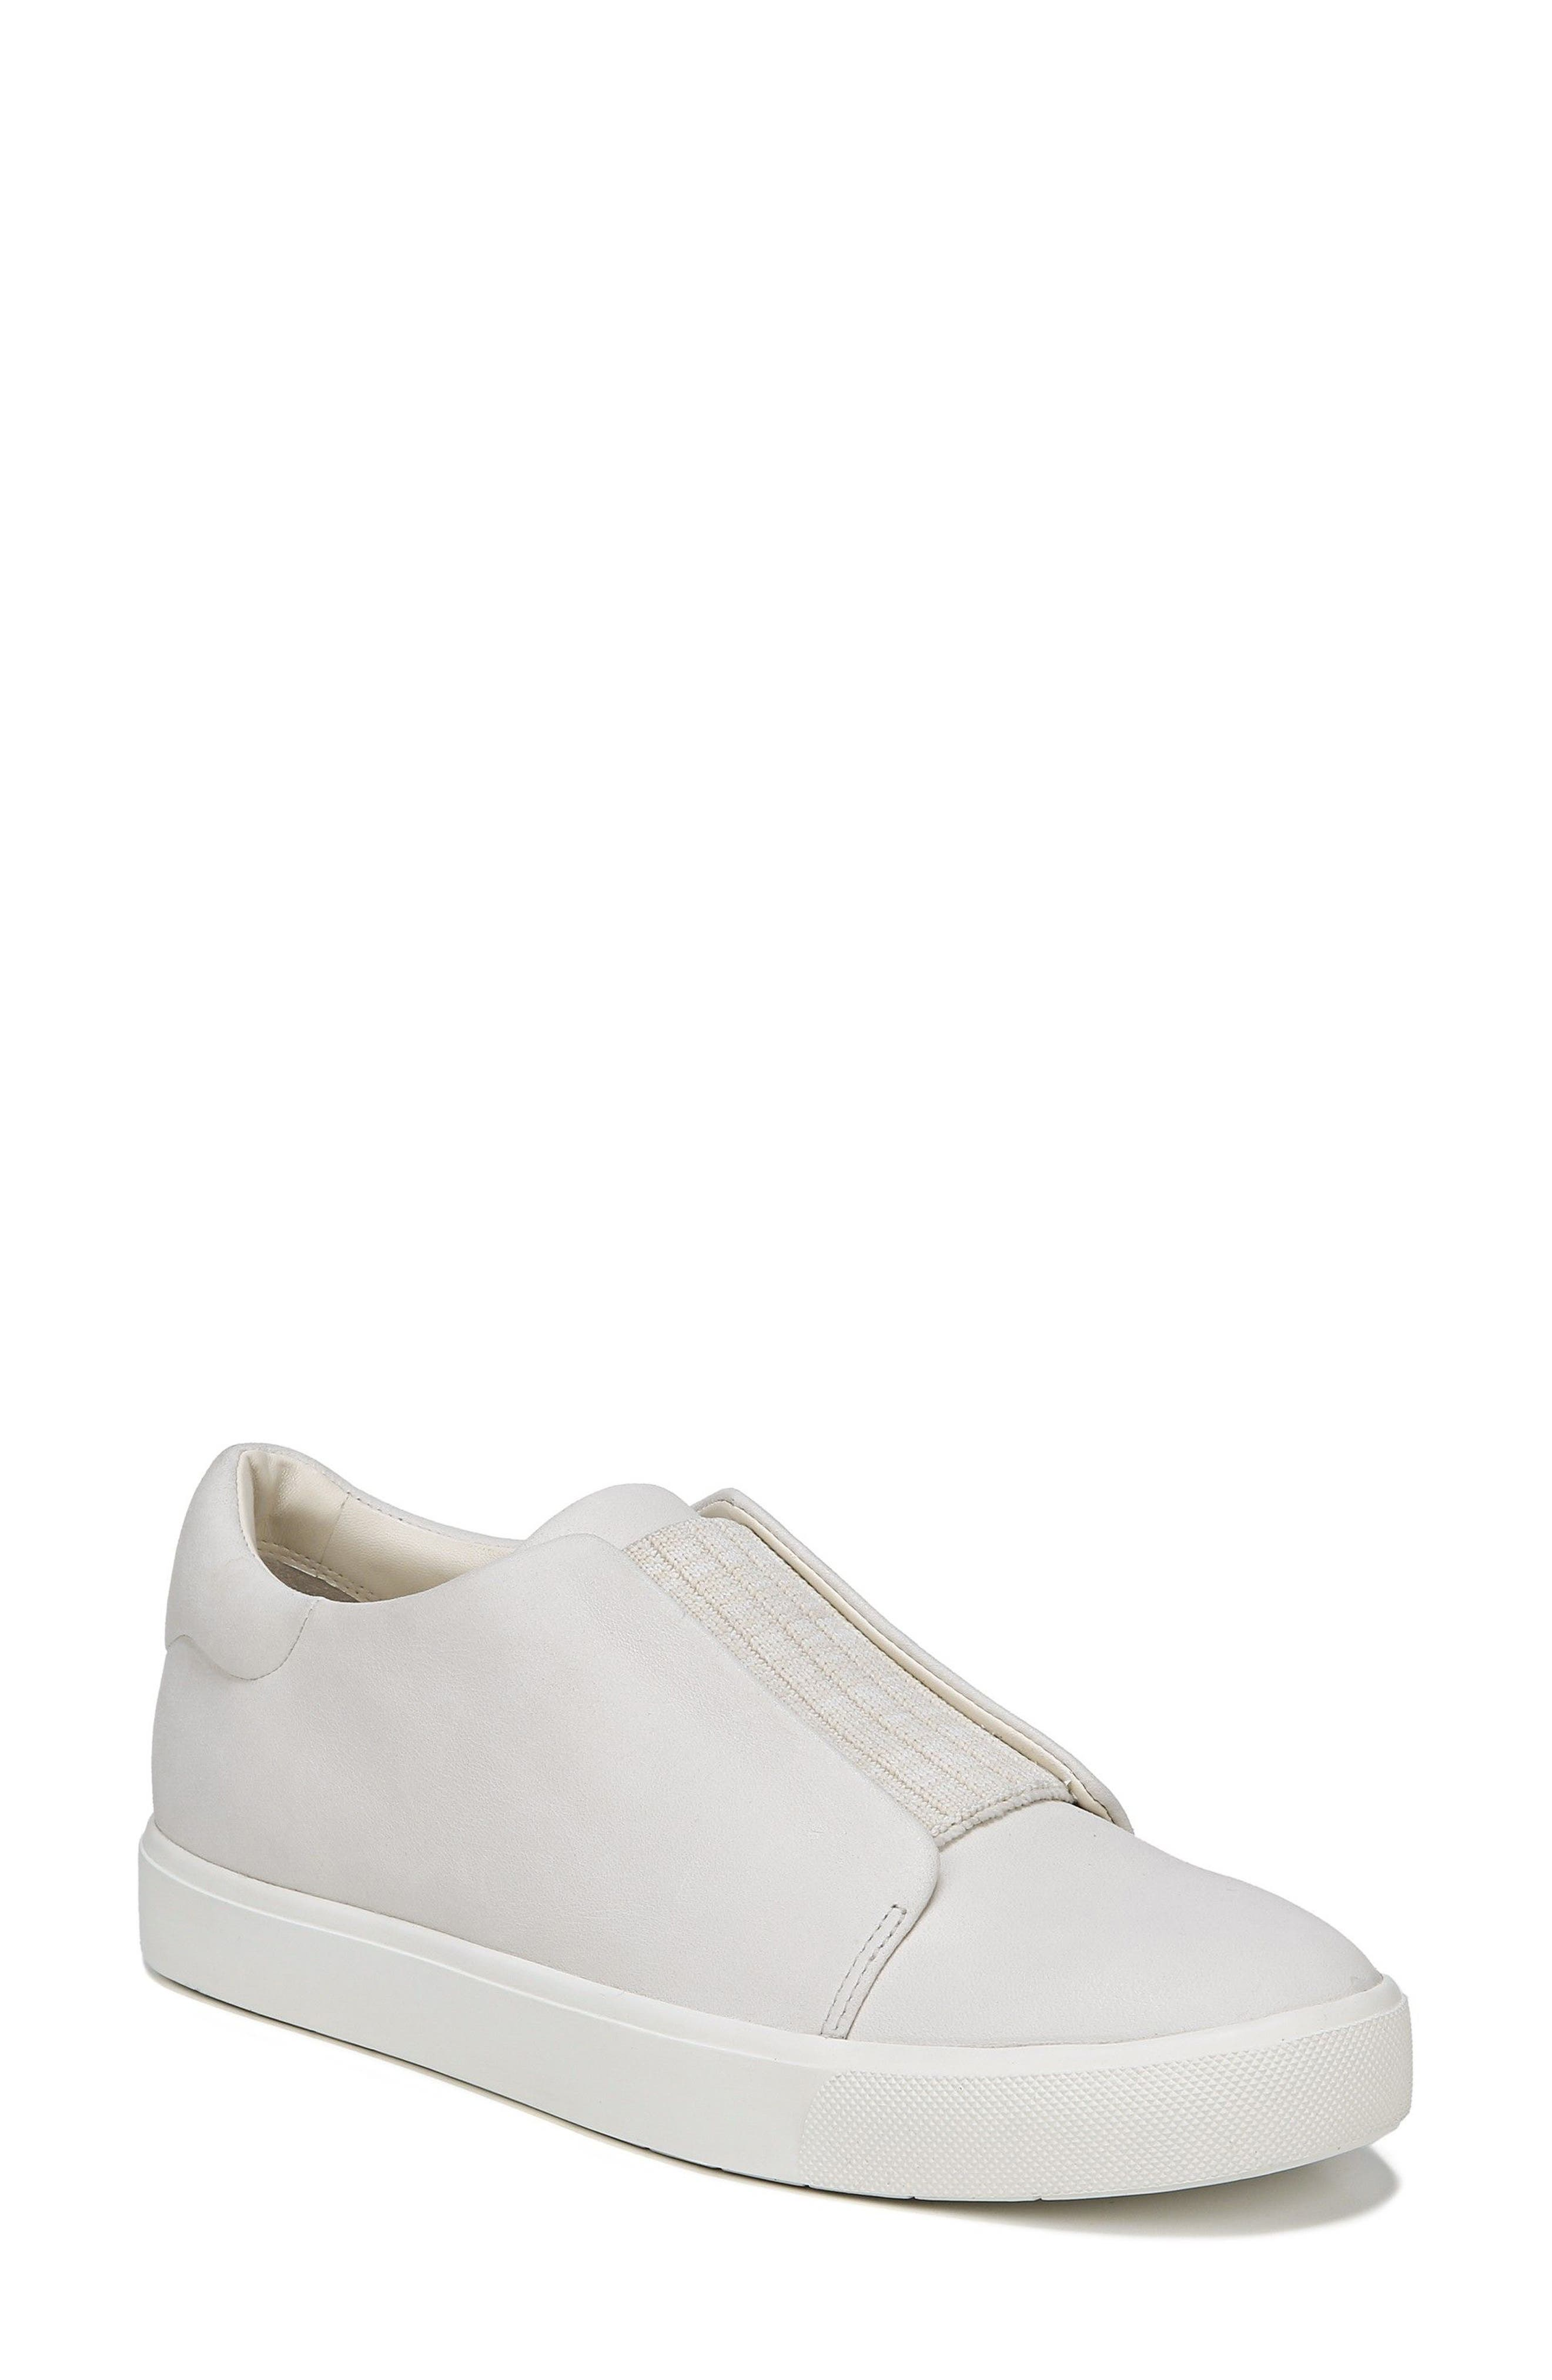 Cantara Slip-On Sneaker,                         Main,                         color, CREAM MARL